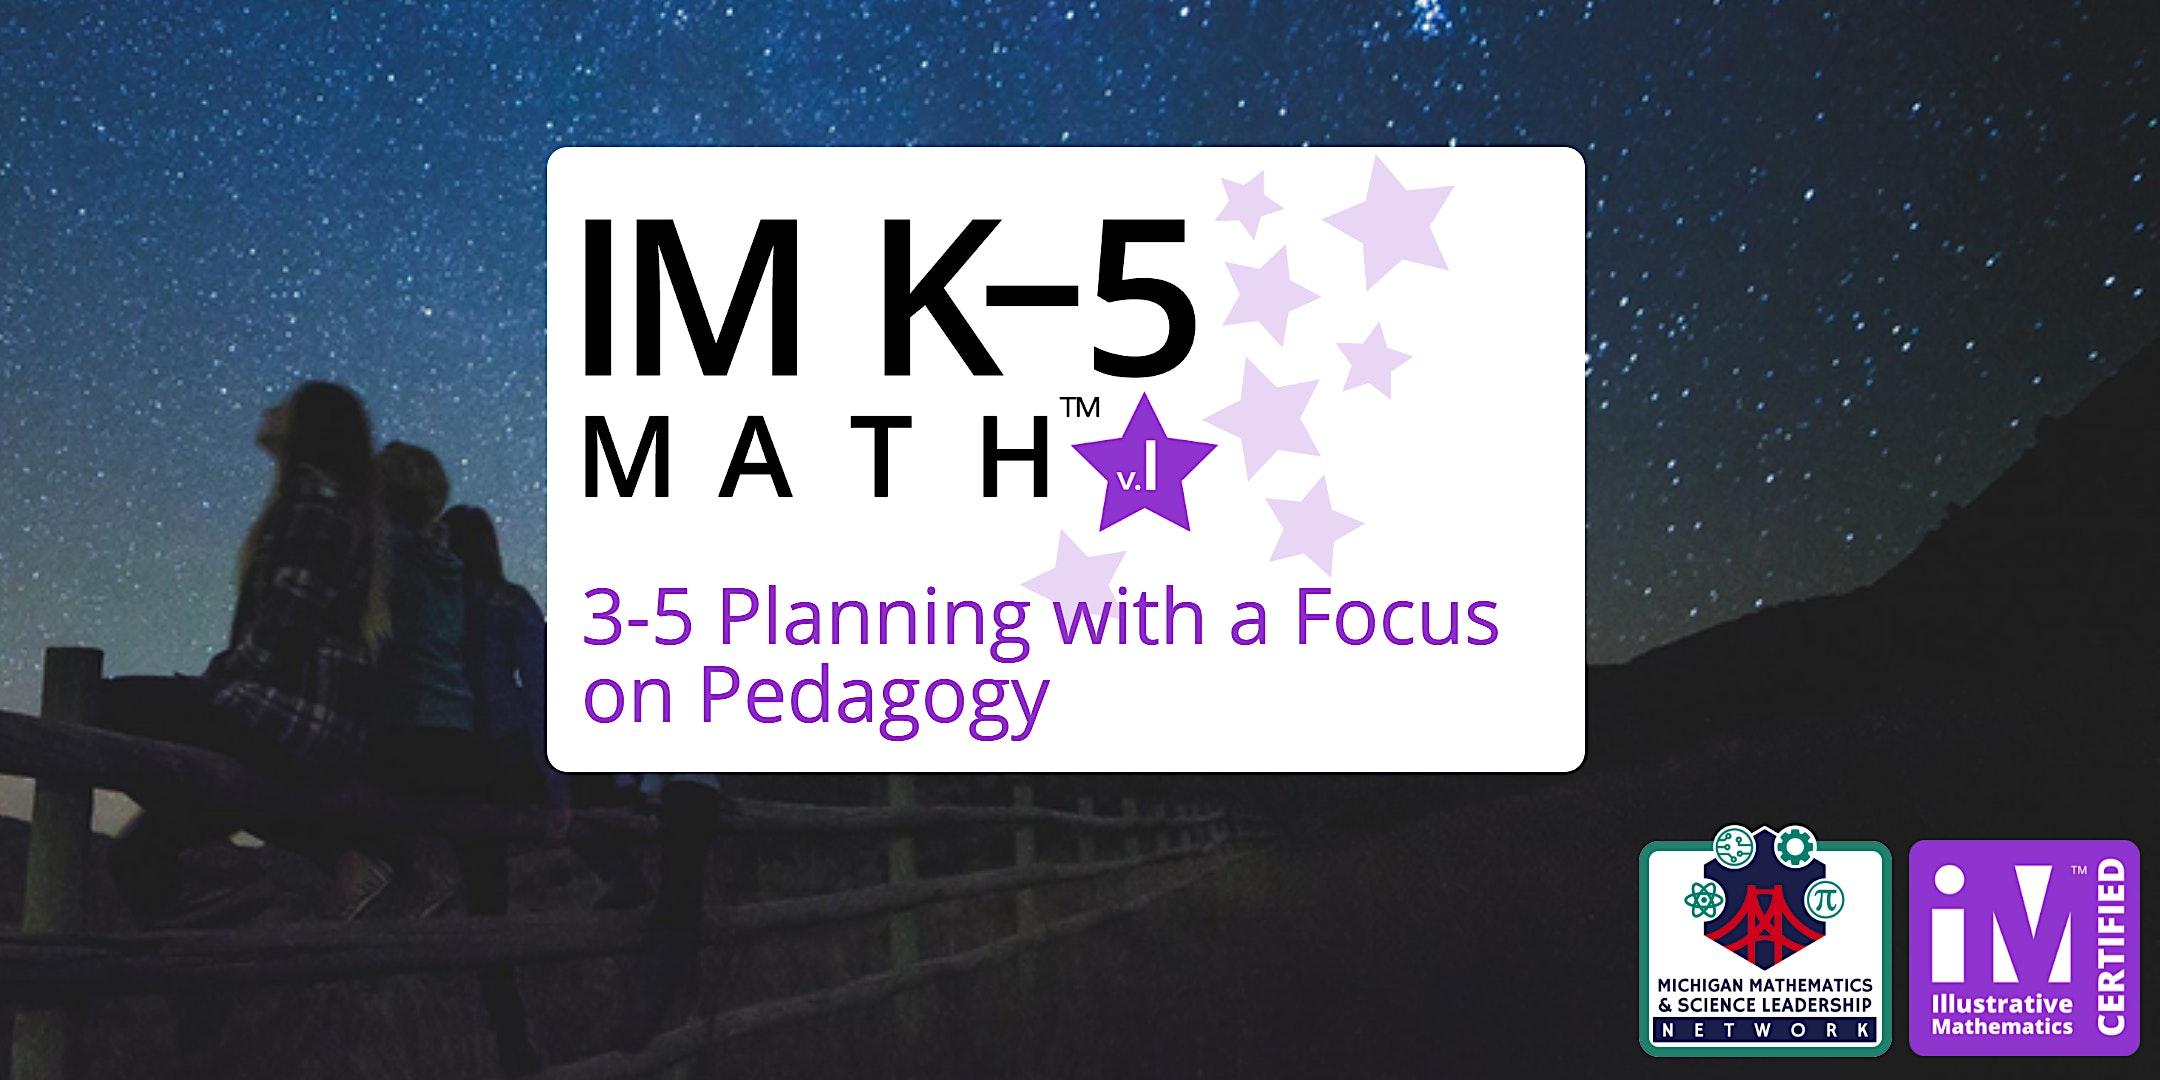 IM K-5 Math: Grades 3-5 Planning with a Focus on Pedagogy